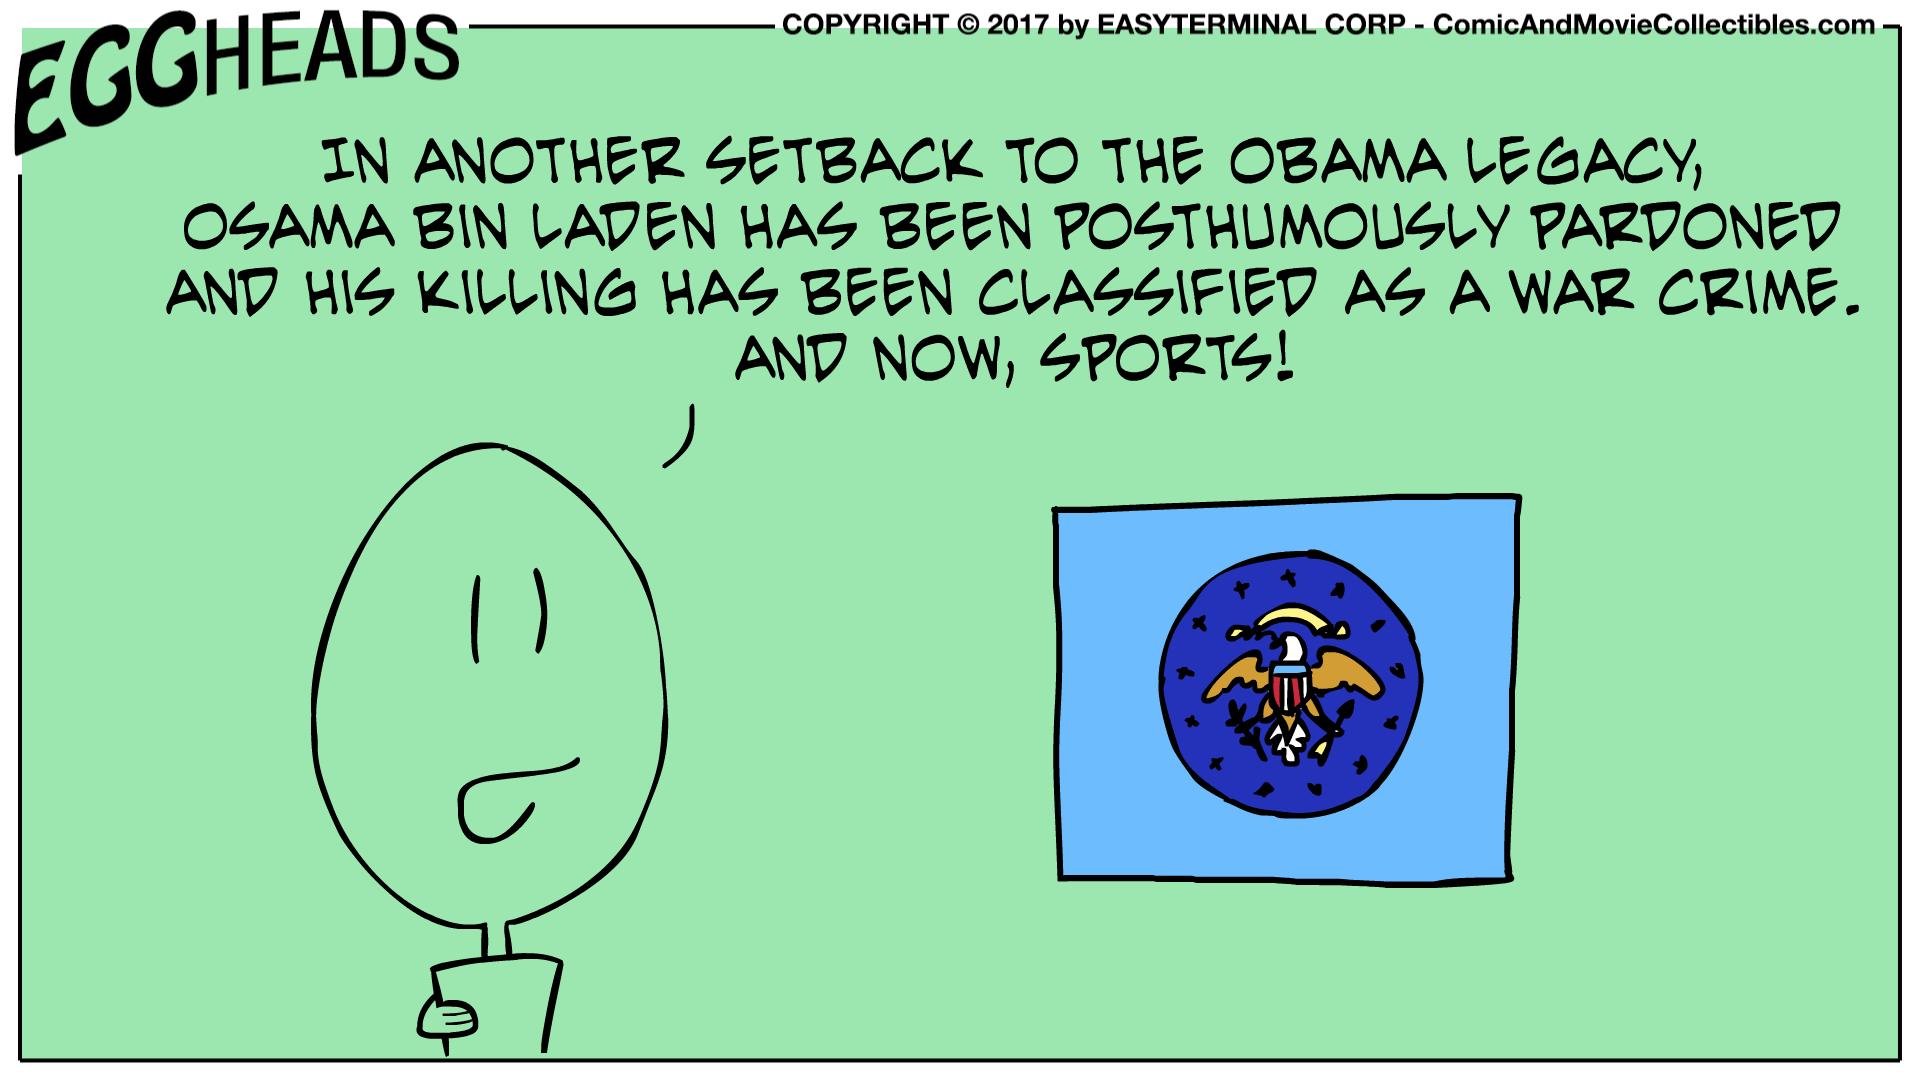 Webcomic Eggheads Comic Strip 017 Osama Bin Laden